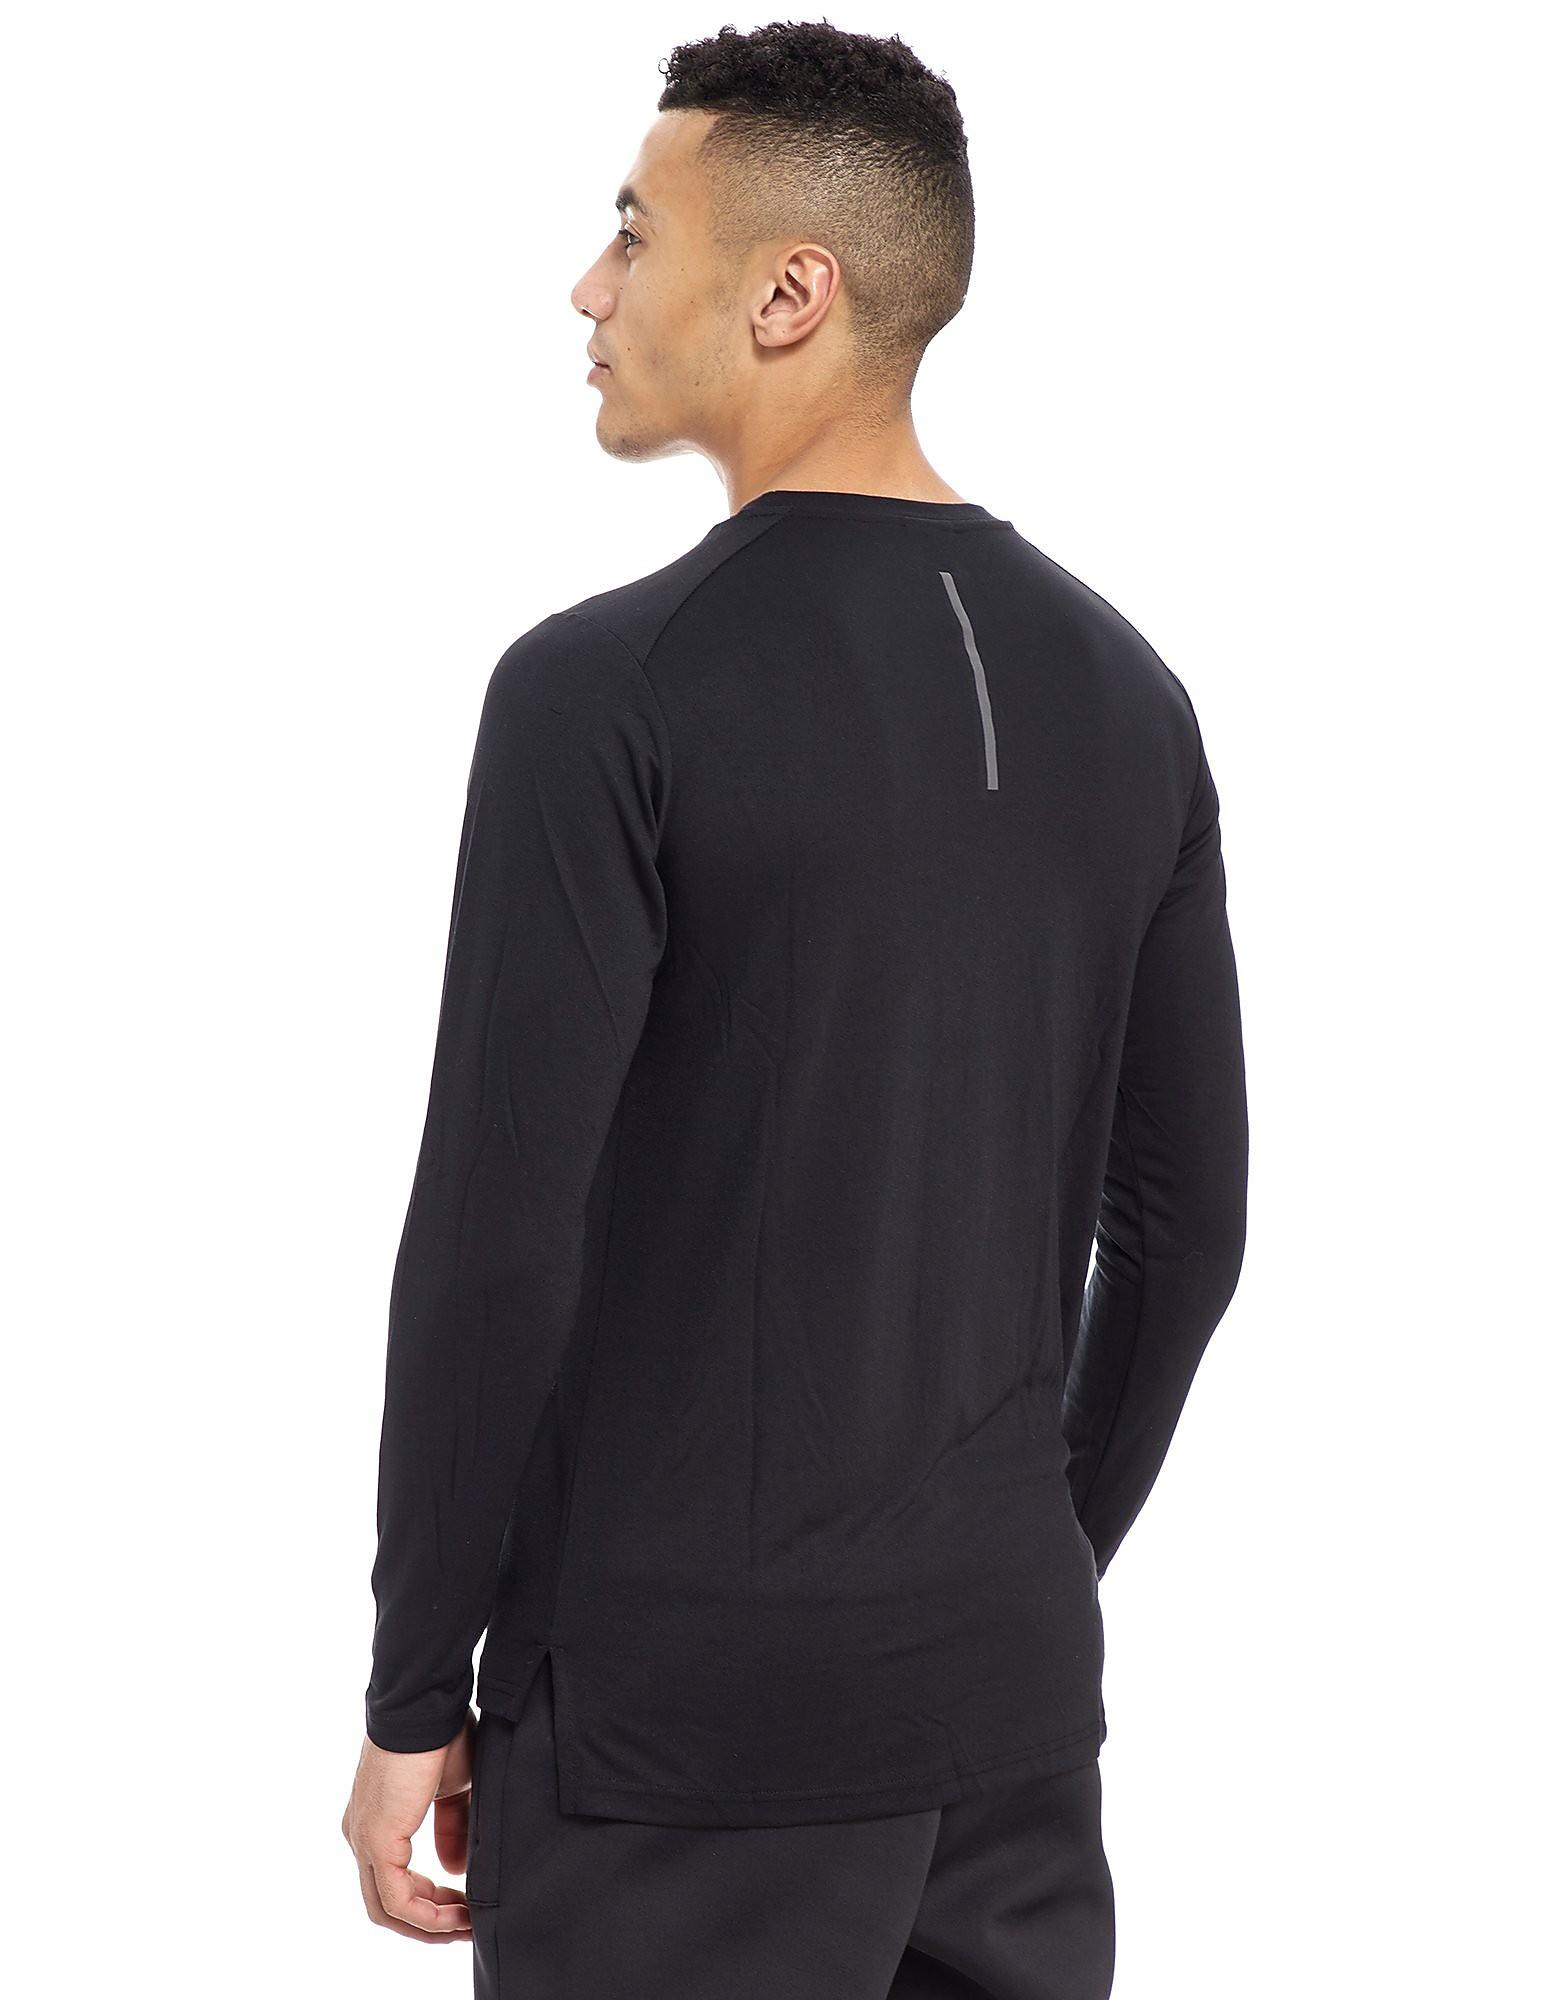 New Balance 247 Liverpool FC Long Sleeve T-Shirt